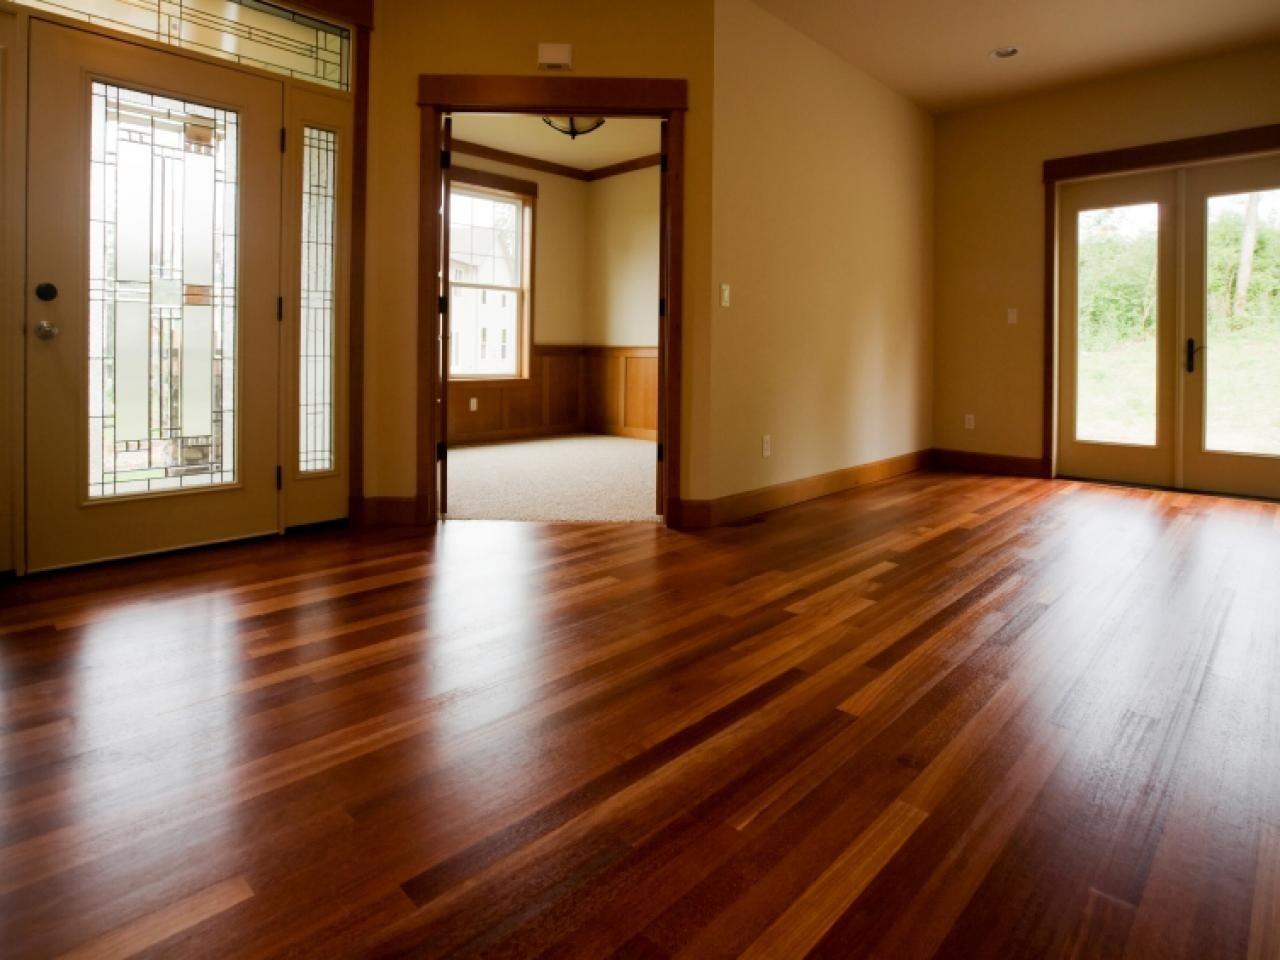 Black Diamond Wood & Laminate Floor Cleaner 3.78 liter: For Hardwood, Real,  Natural & Engineered Flooring -Biodegradable Safe for Cleaning All Floors:  ... - Black Diamond Wood & Laminate Floor Cleaner 3.78 Liter: For